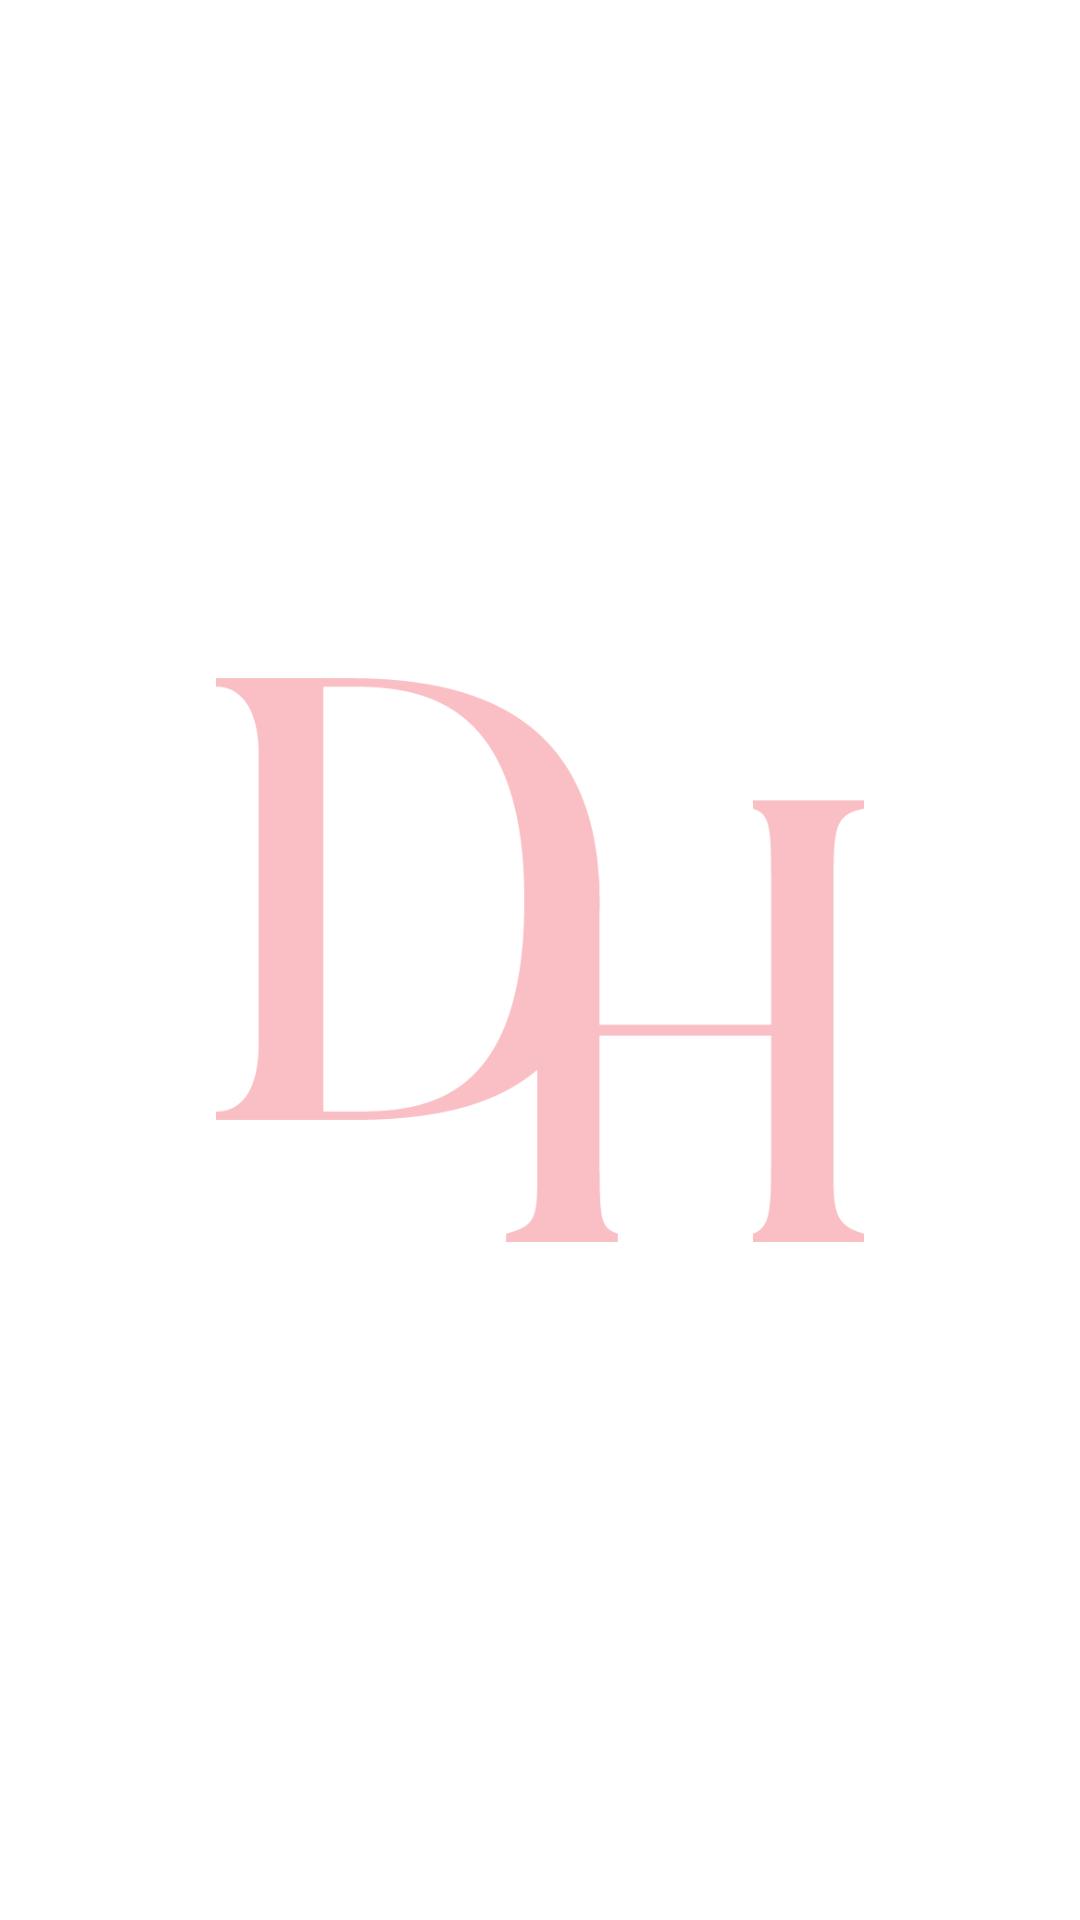 Doll House Beauty Parlor Logo